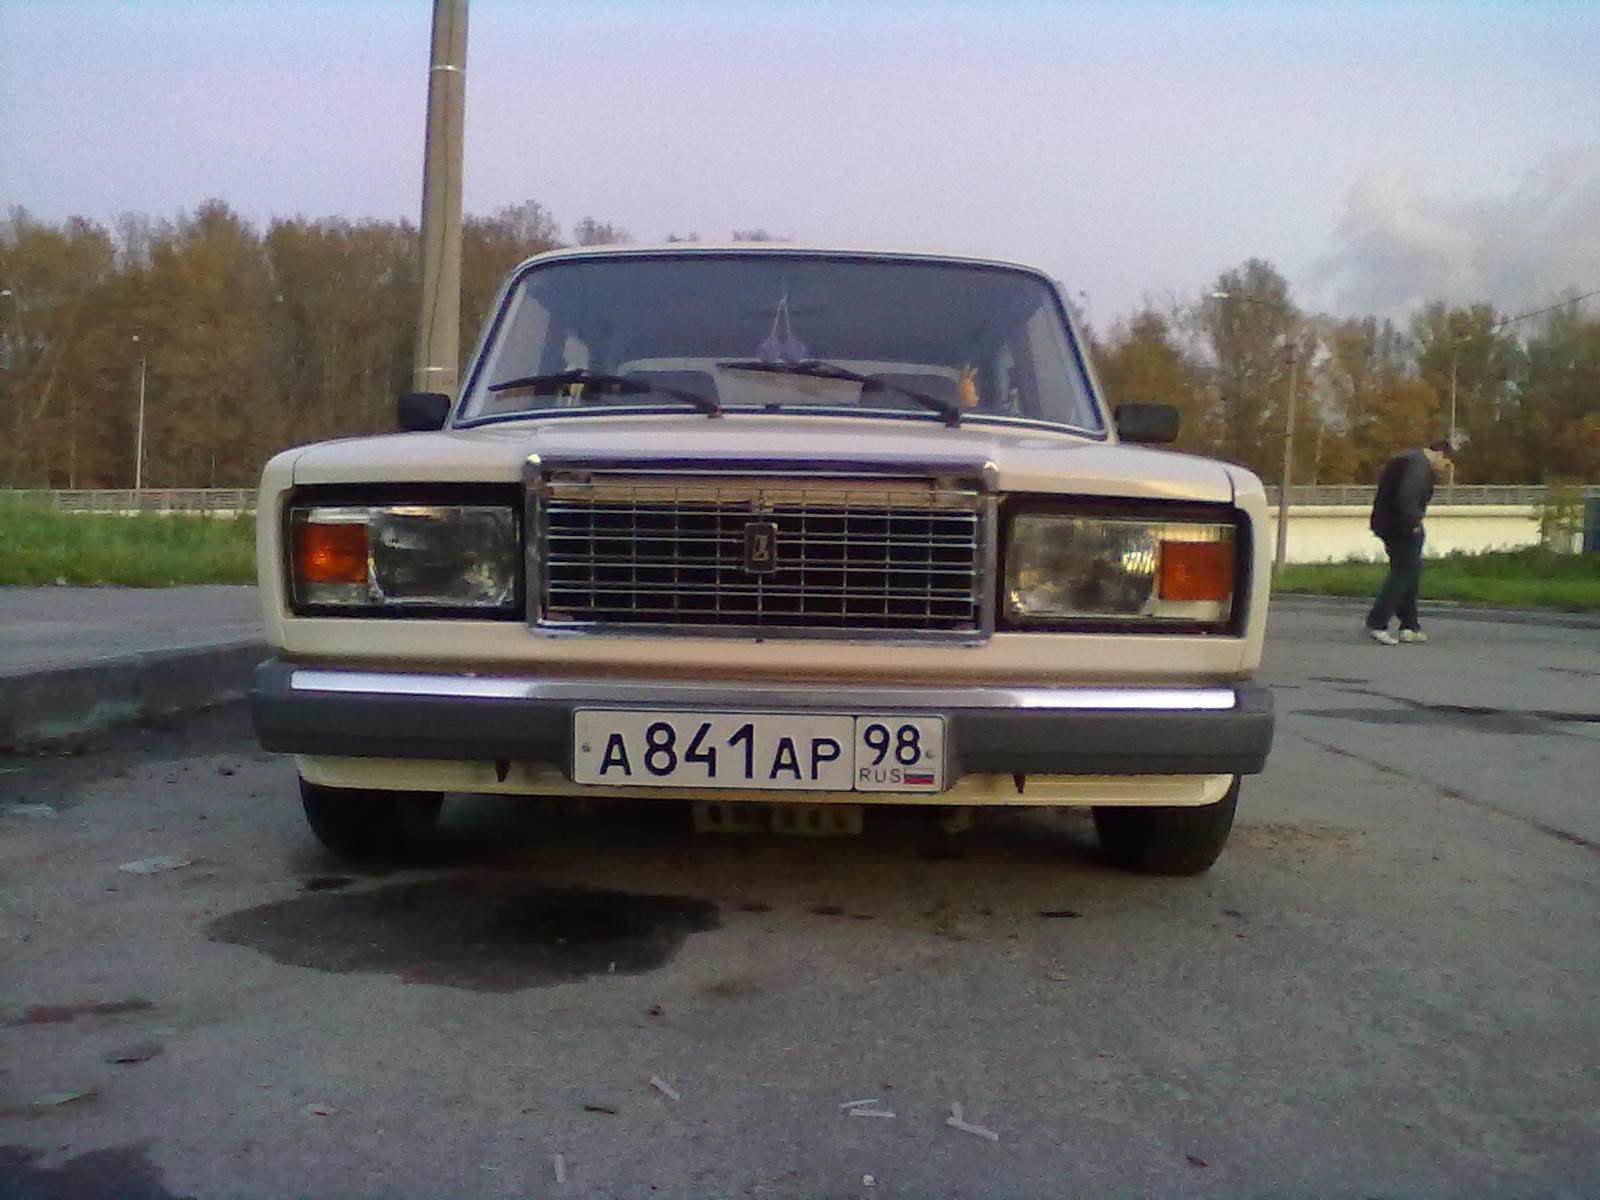 фары на ваз 2107 фото | Фотографии ...: avto.bigbo.ru/?p=3382